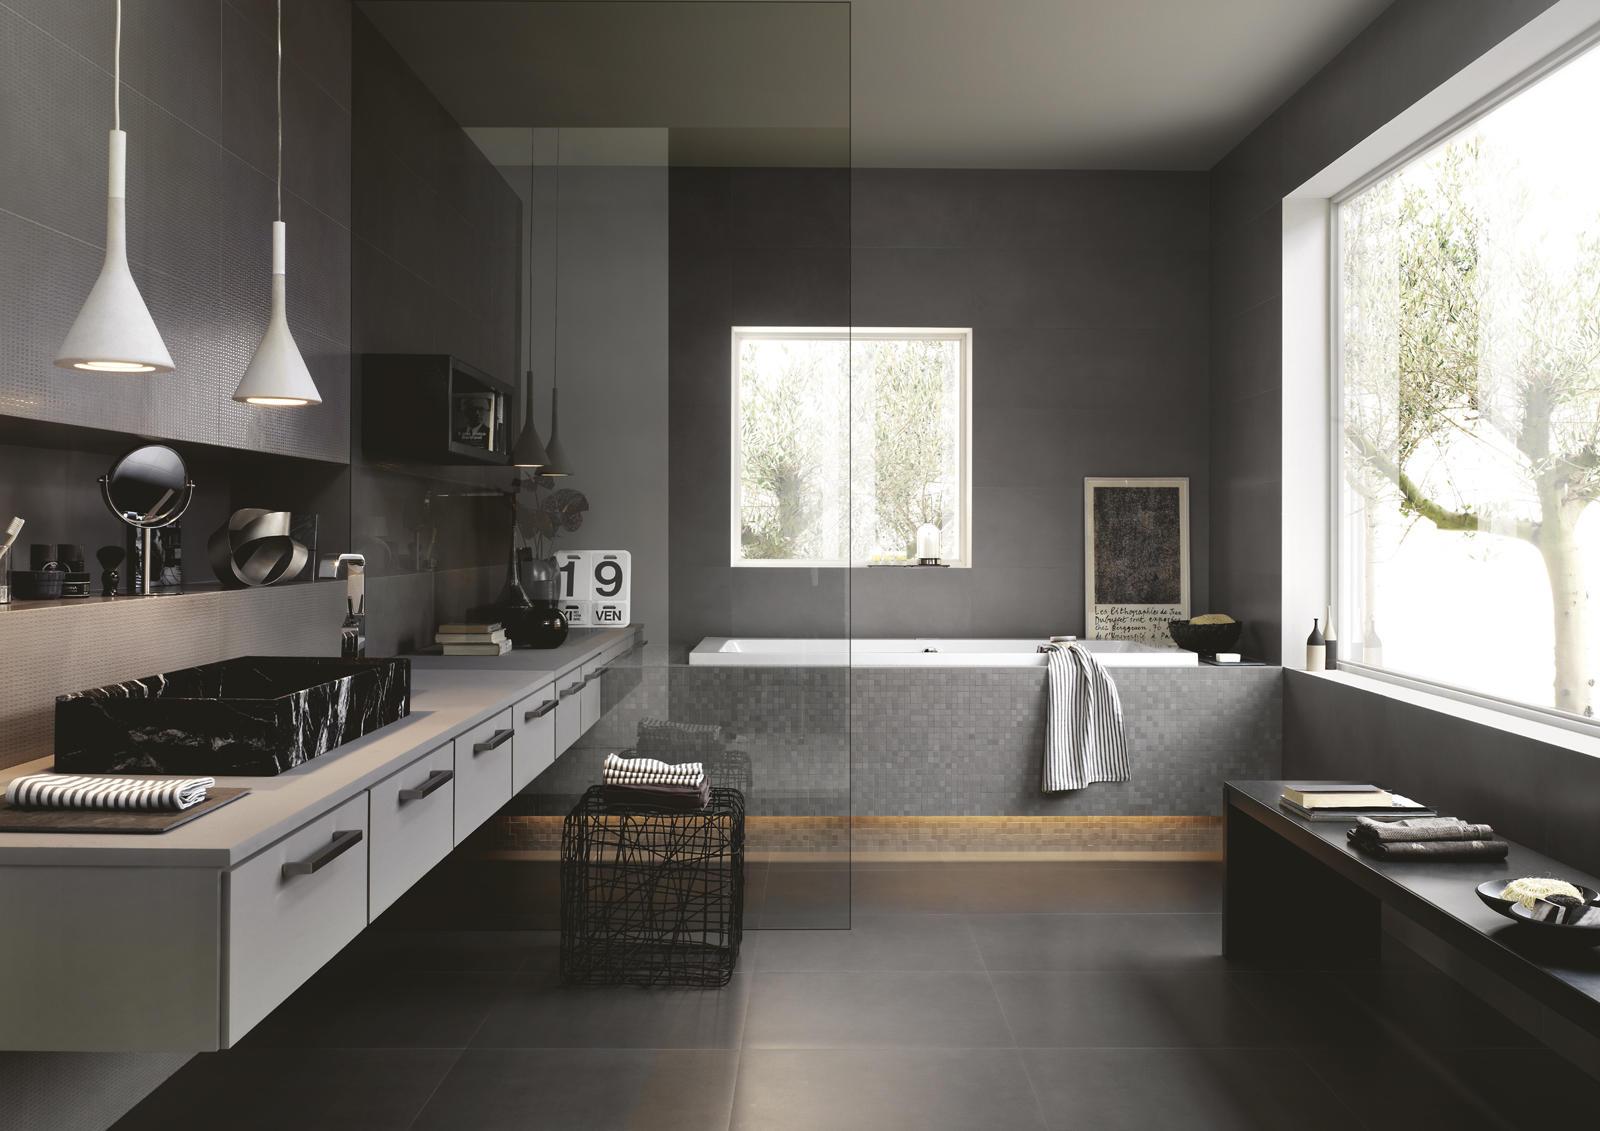 marazzi design kitchen gallery.  CONCRETA Ceramic Tiles From Marazzi Group Architonic